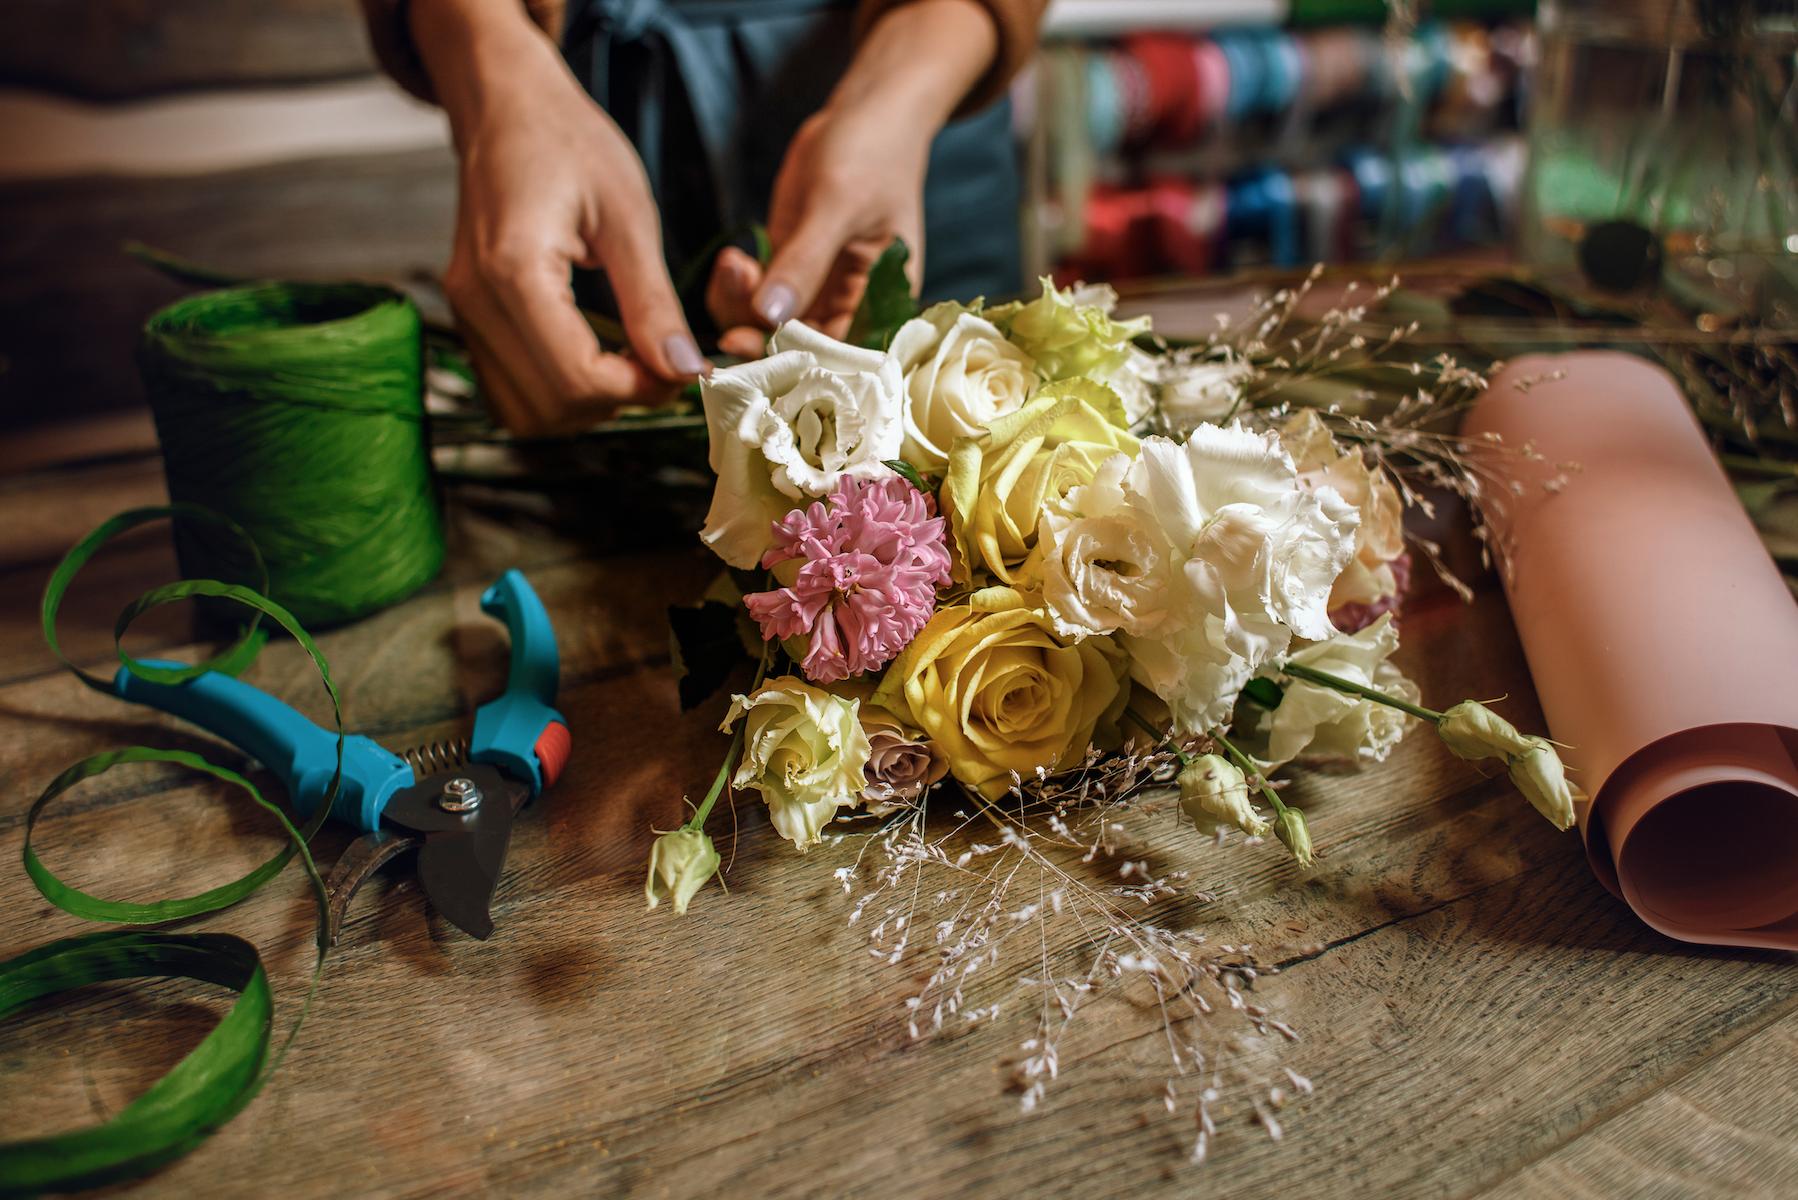 Small business florist arranging a bouquet